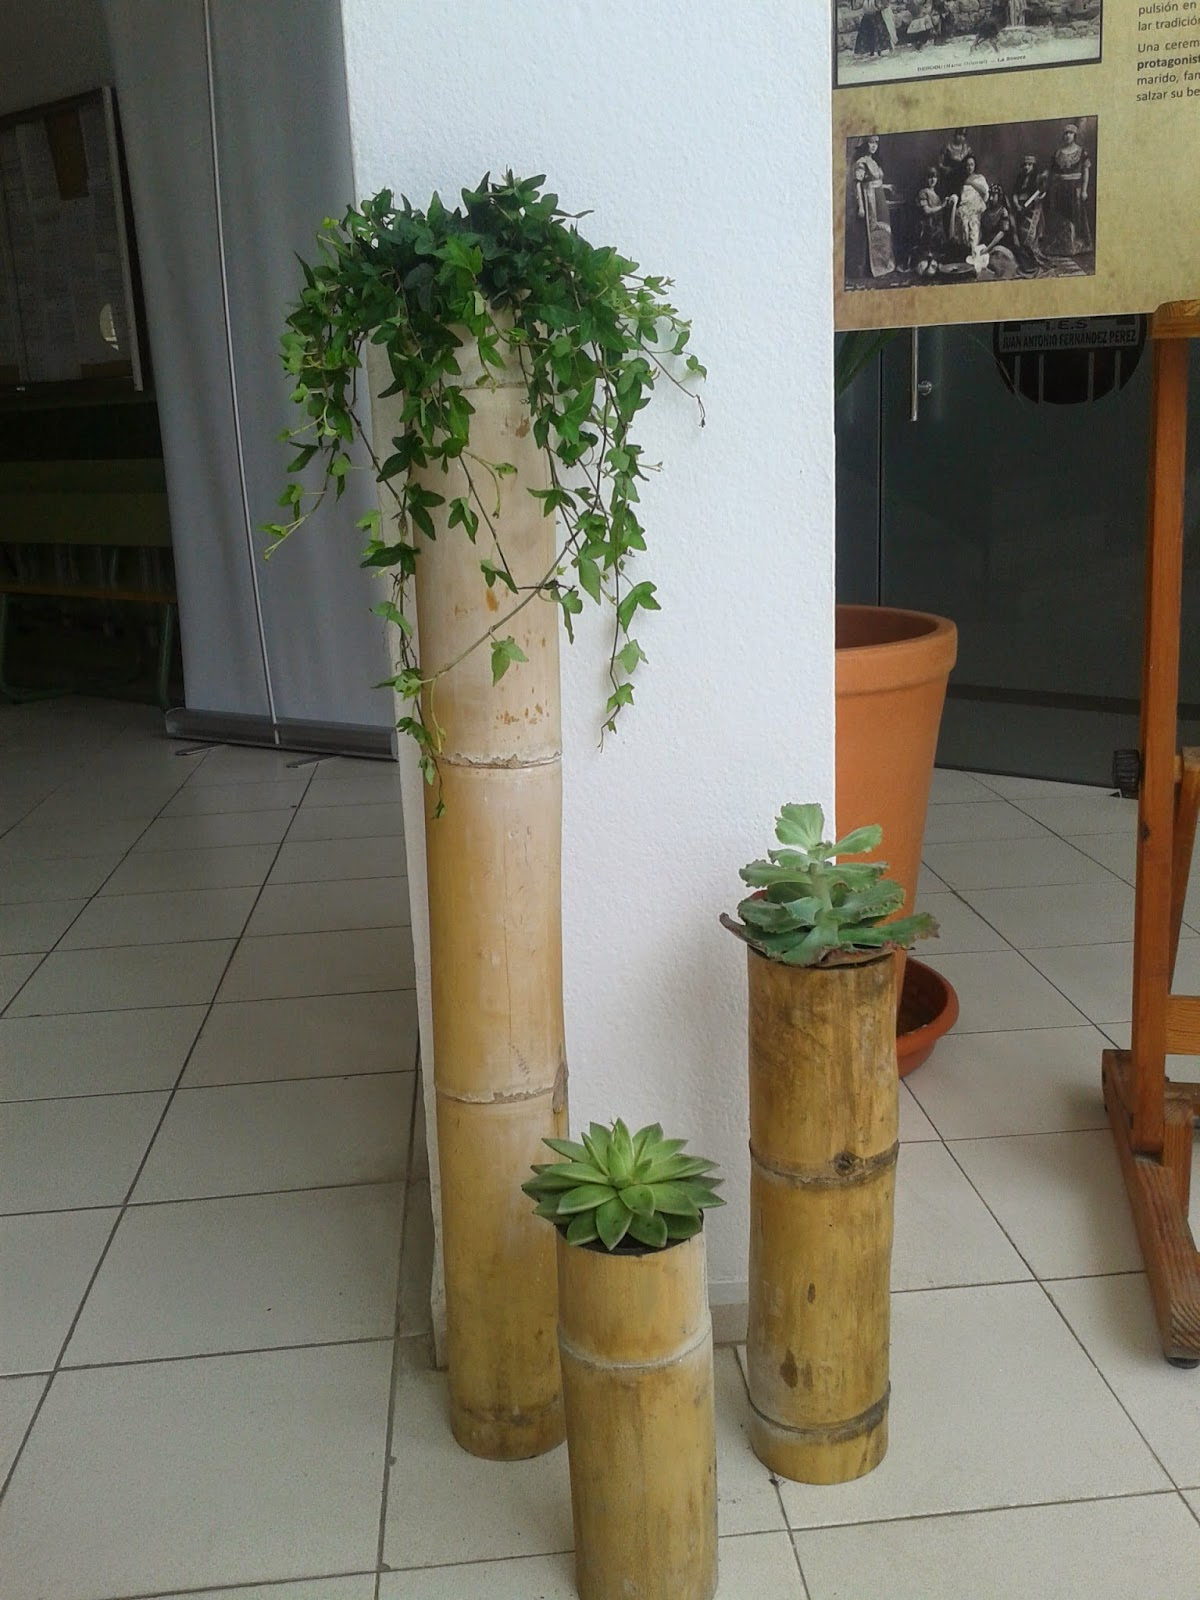 Agraria huerta salama jardines verticales - Jardineras con bambu ...